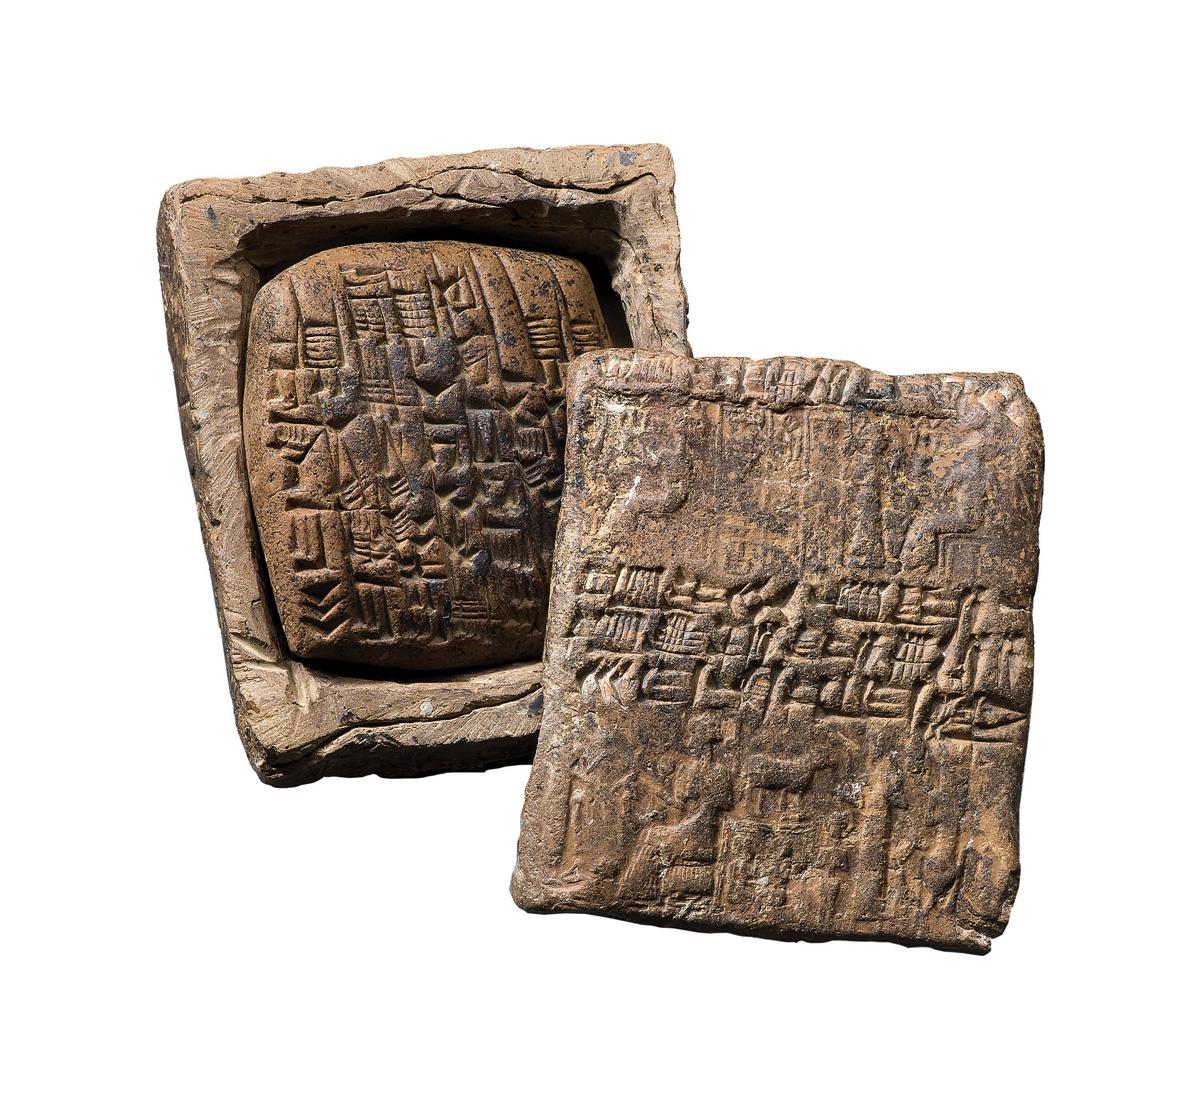 Busta d'argilla con tavoletta racchiusa all'interno. Kanesh Paleo-assiro (XIX sec. a.C.). Argilla